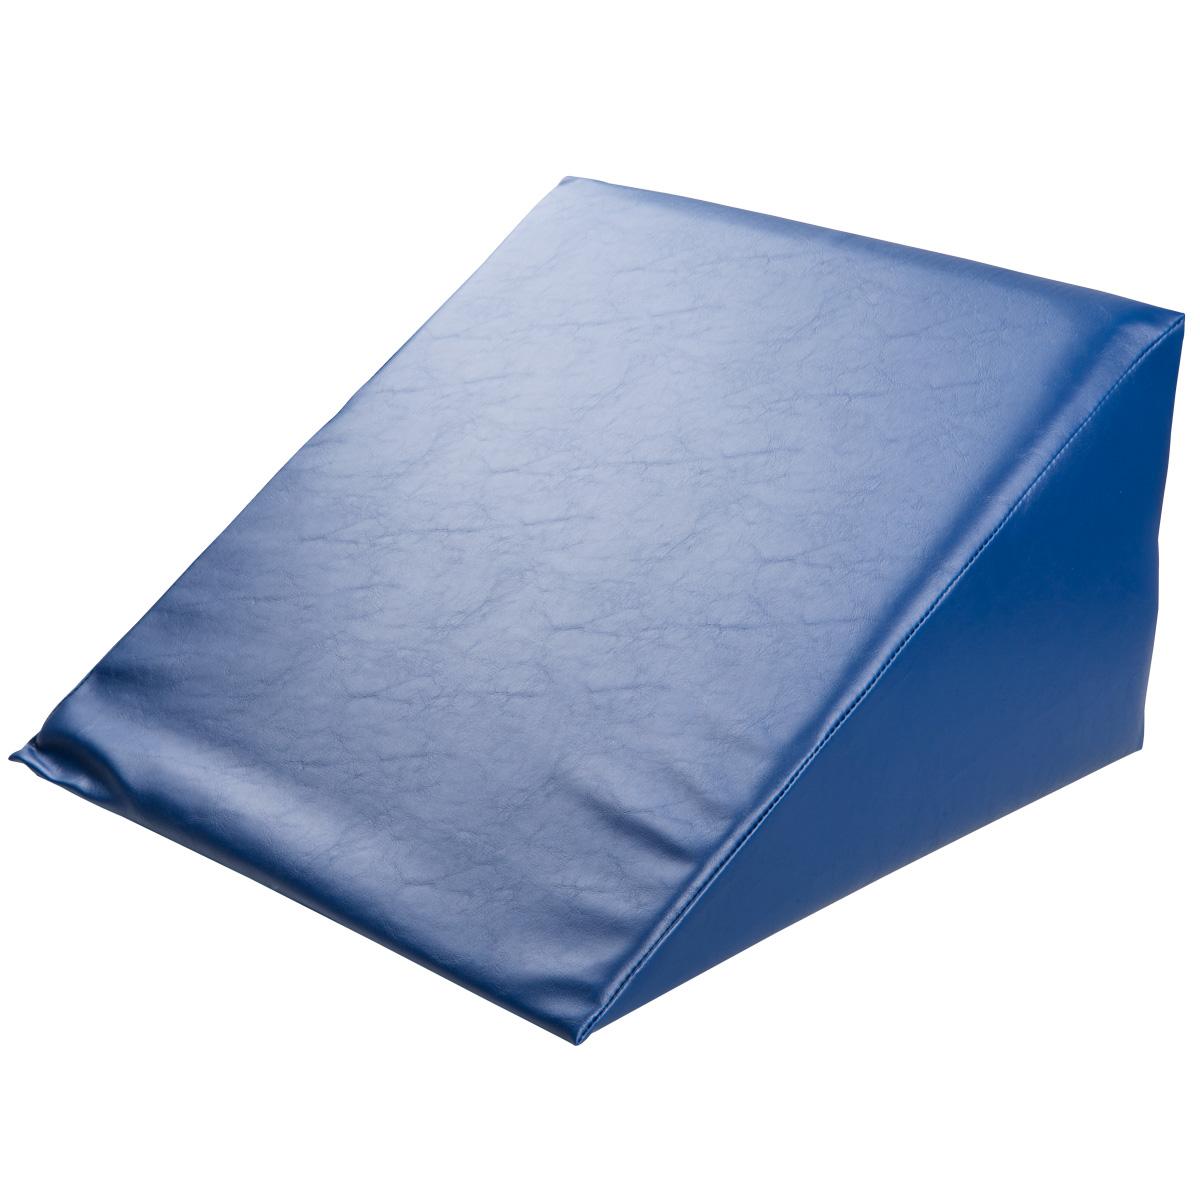 Large Foam Wedge Pillow - 1004999 - 3B Scientific - W15099DB - Bolsters Wedges Skillbuilder ...